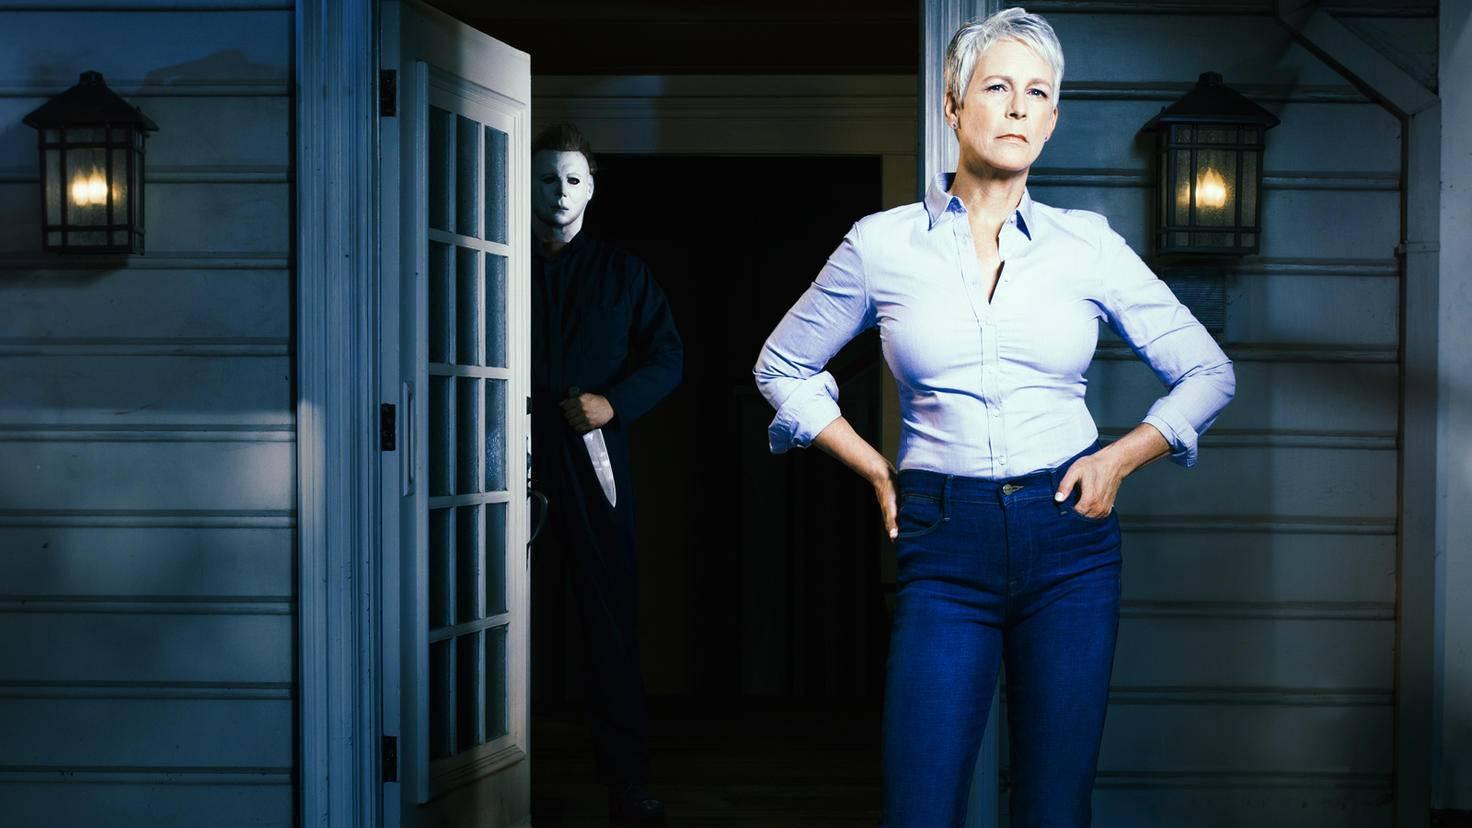 Halloween-Sequel-Jamie Lee Curtis-Universal Pictures-AA68_AE_D001_0002R_CROP